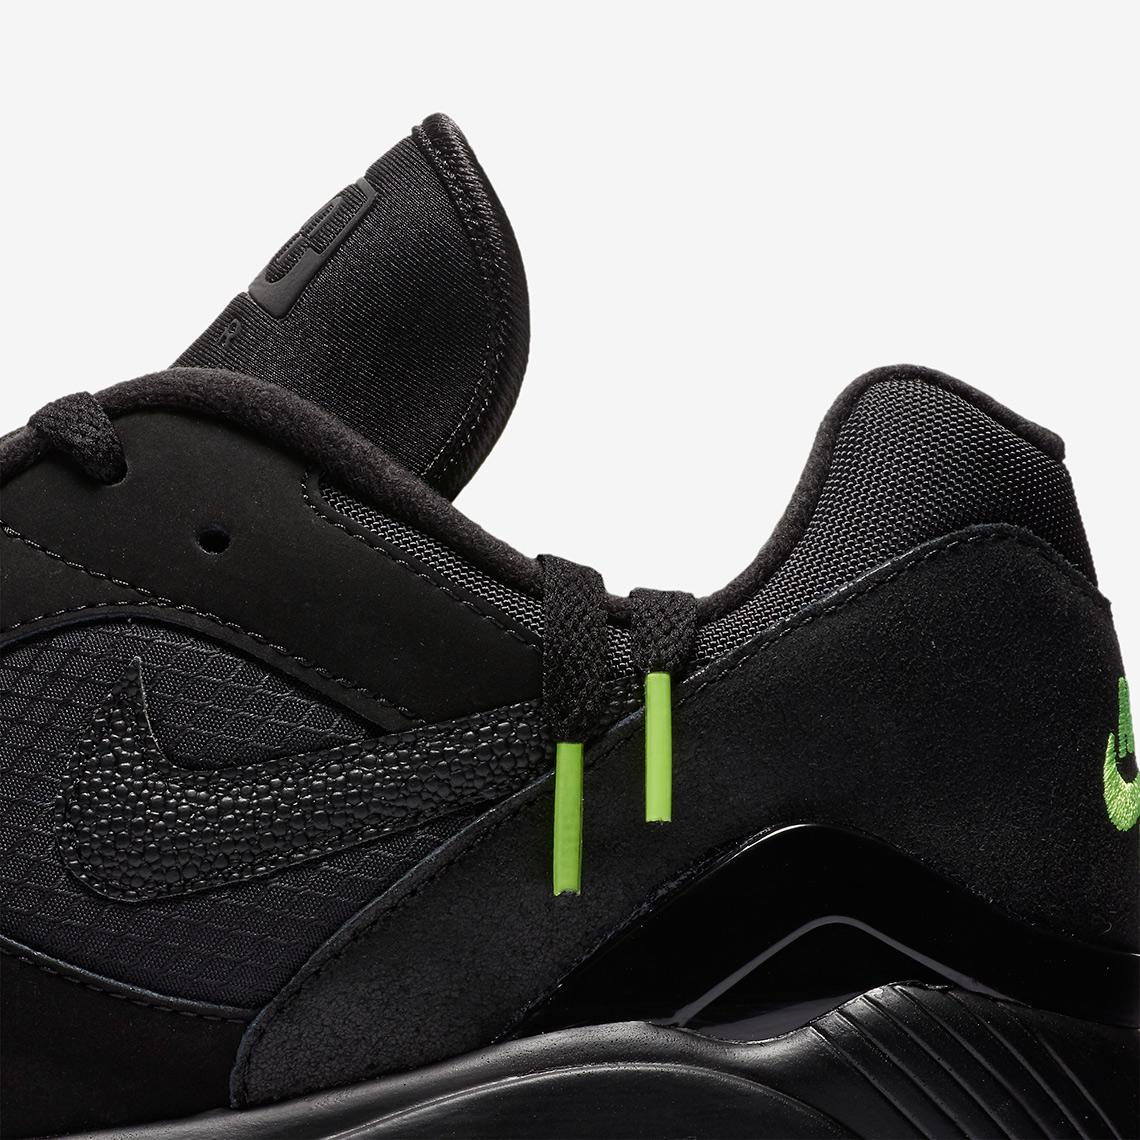 Nike Air Max 90 + 180 Night Ops Pack Release Info  f31b5cf06